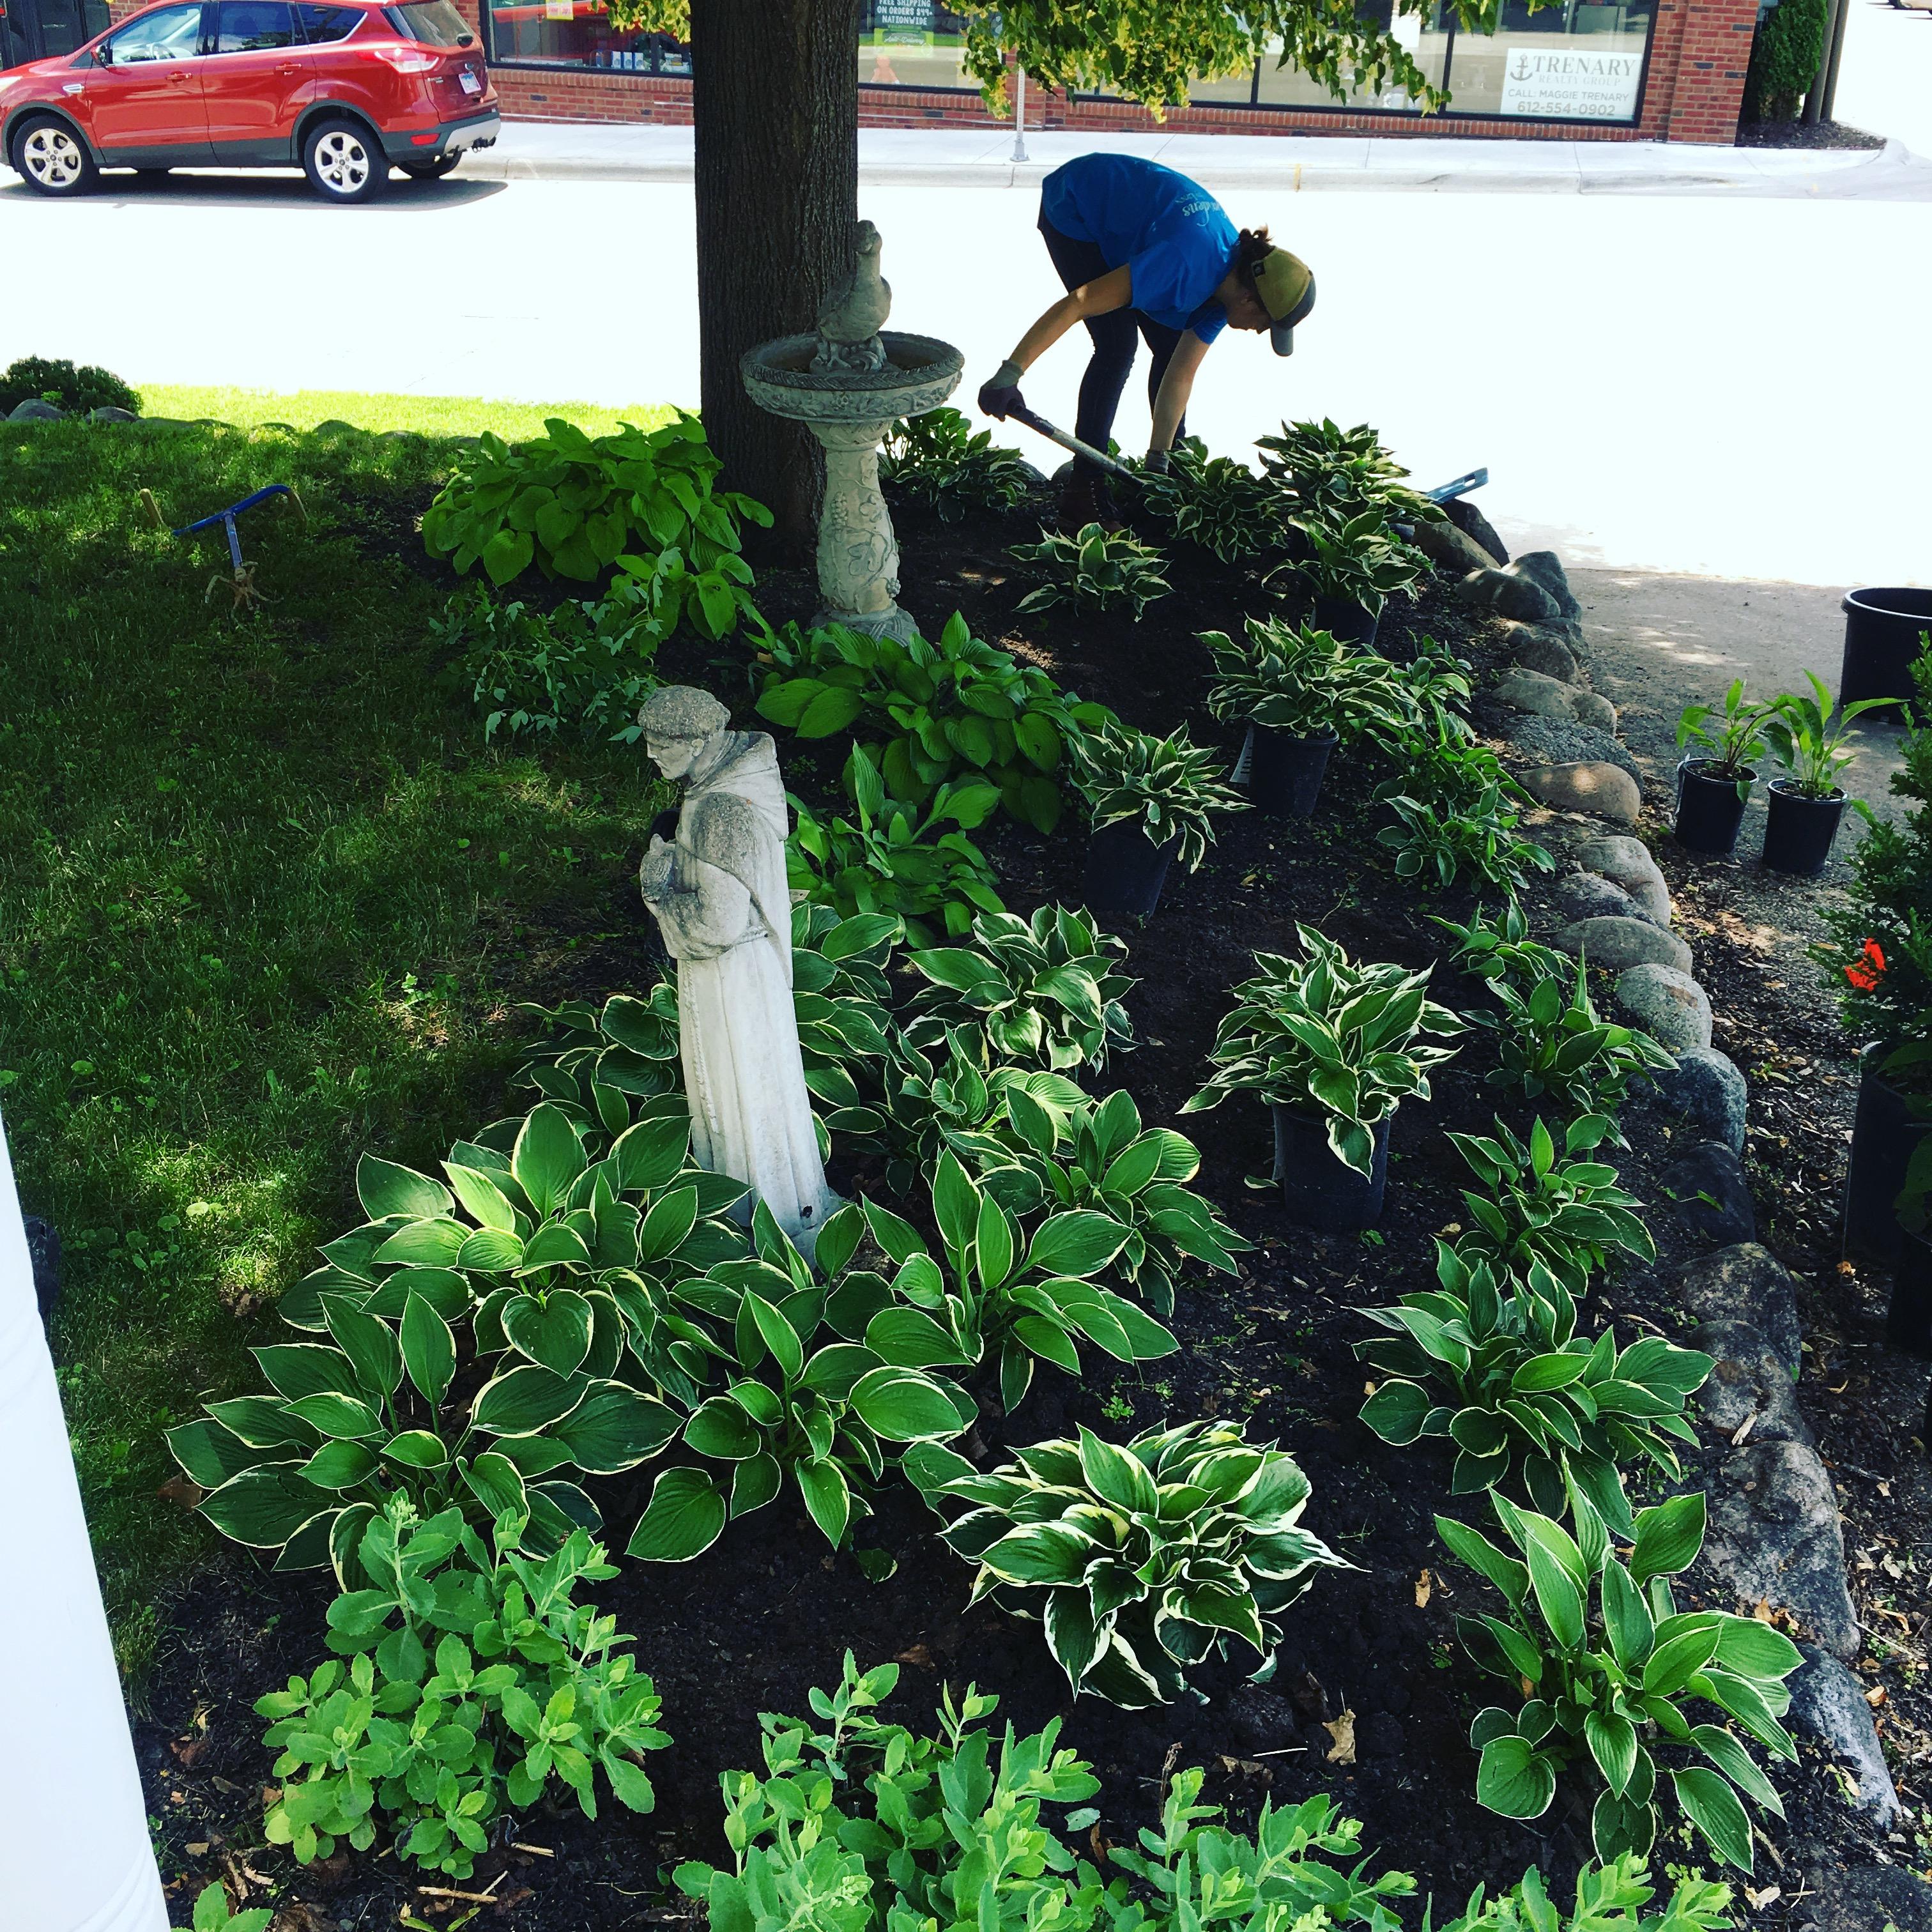 Planting a hosta garden.